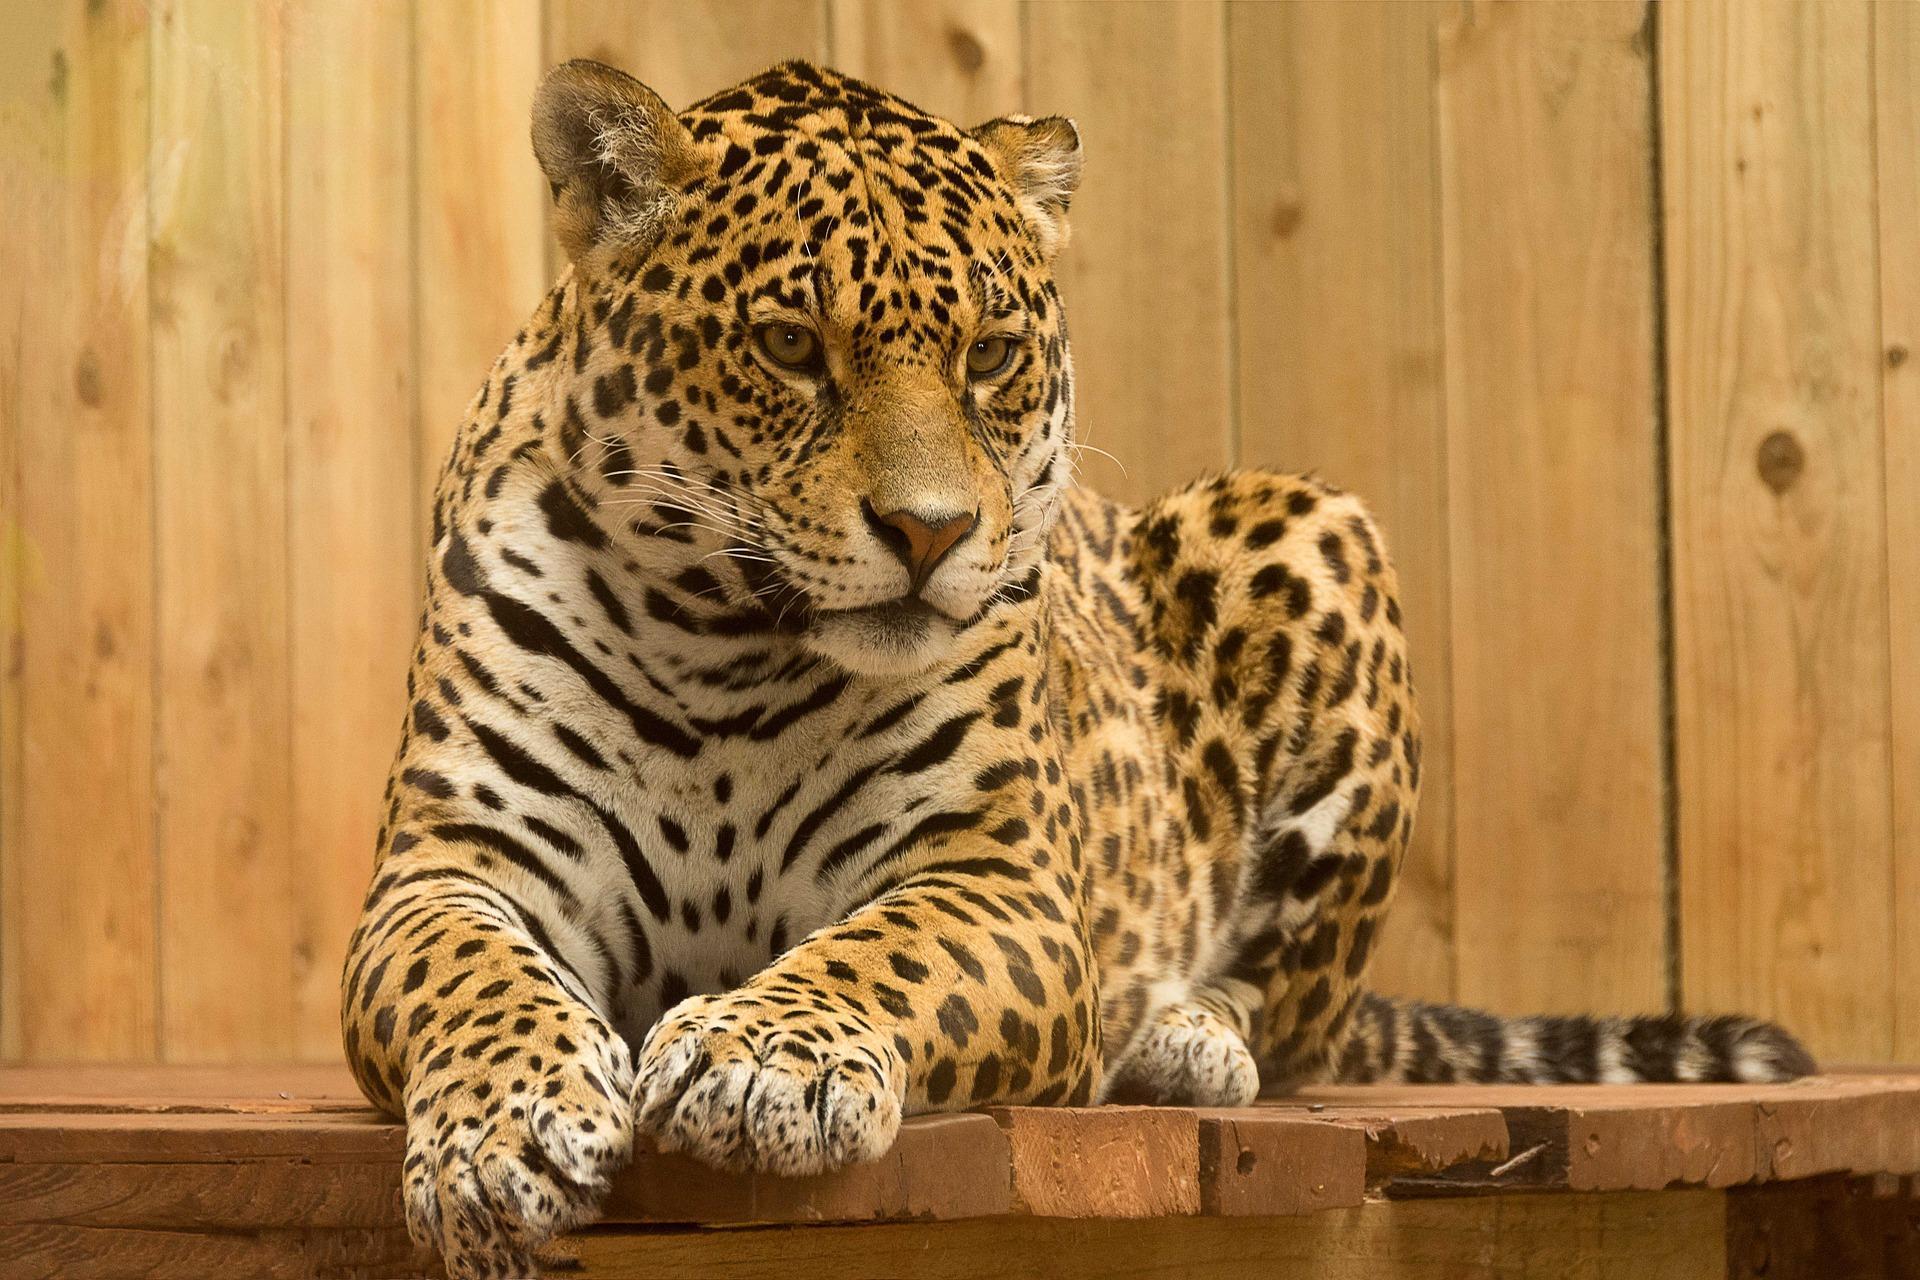 Jaguar Wallpaper Hd For Android Apk Download